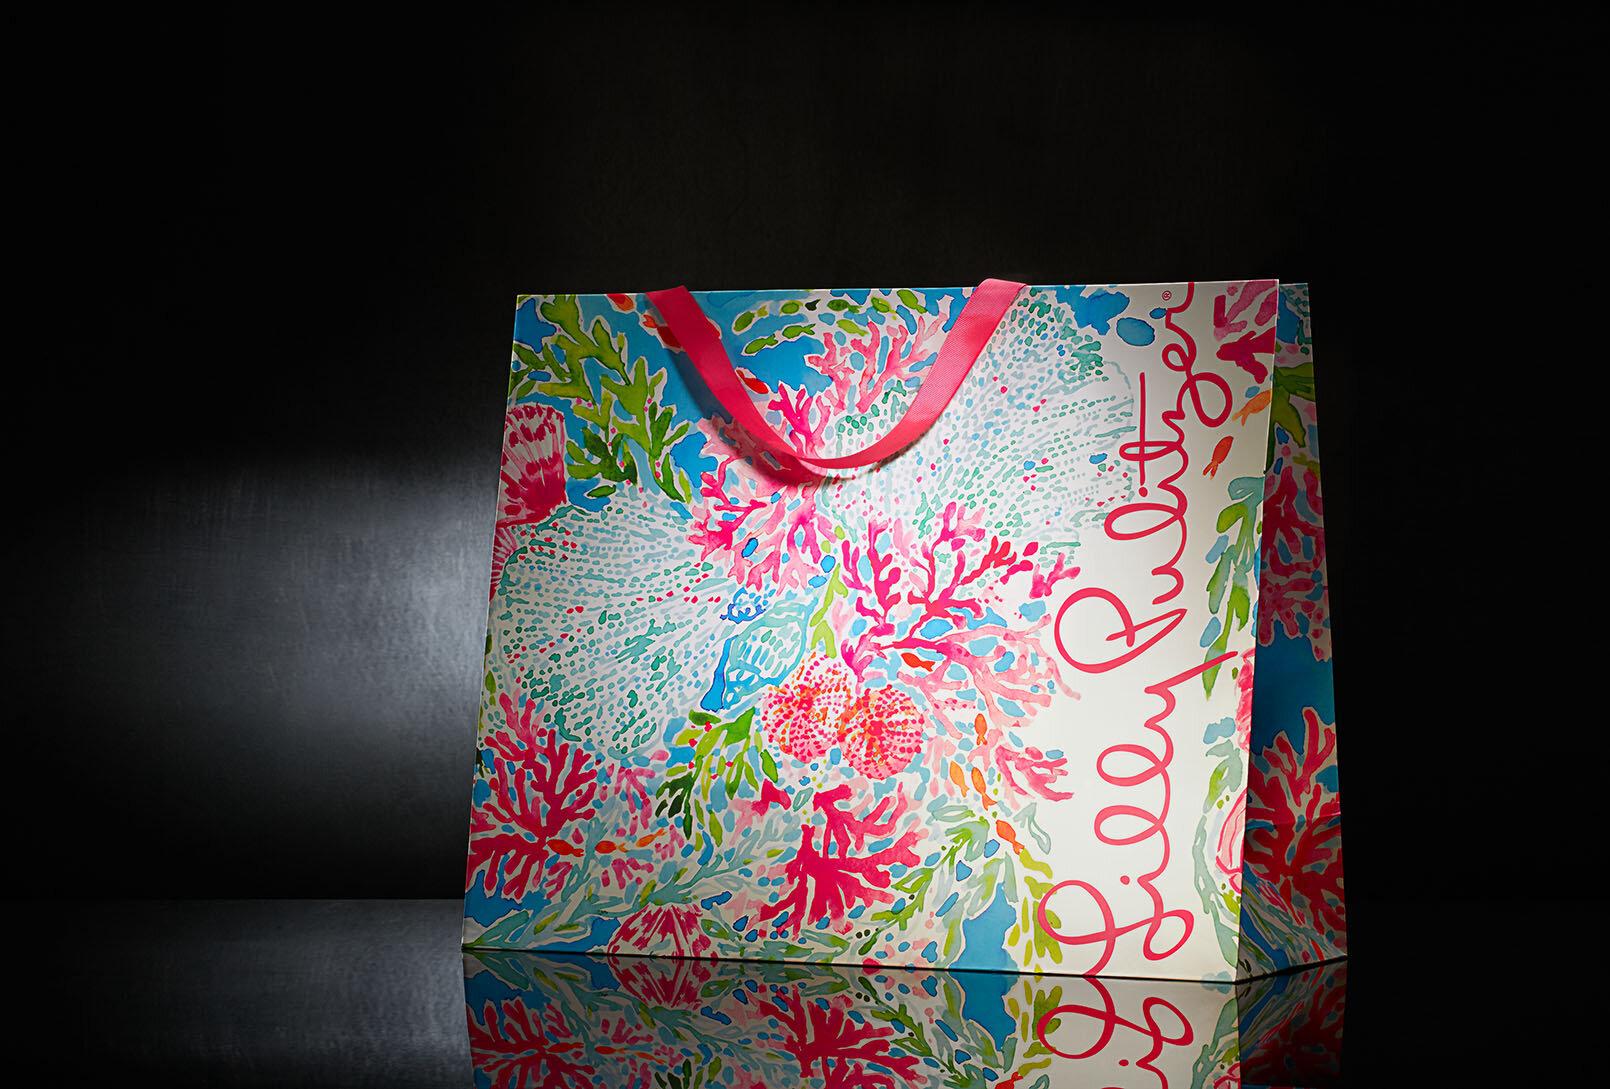 lilly_pulitzer_luxury_retail_design_packaging.jpg.